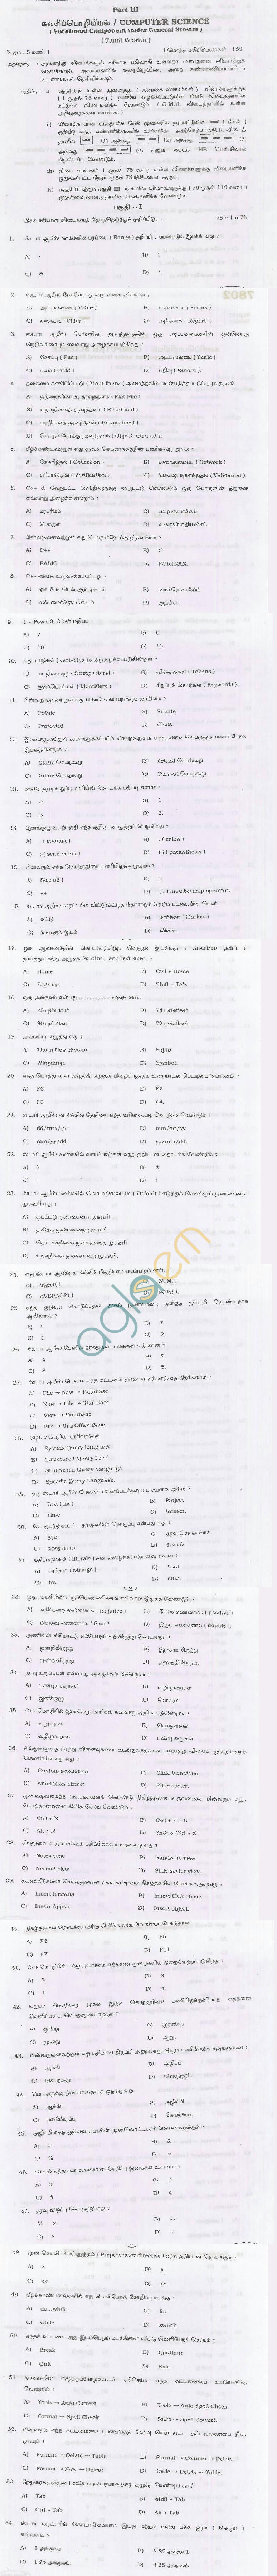 TN Board Higher Secondary (Plus 2)Computer ScienceQuestion PapersJune 2011